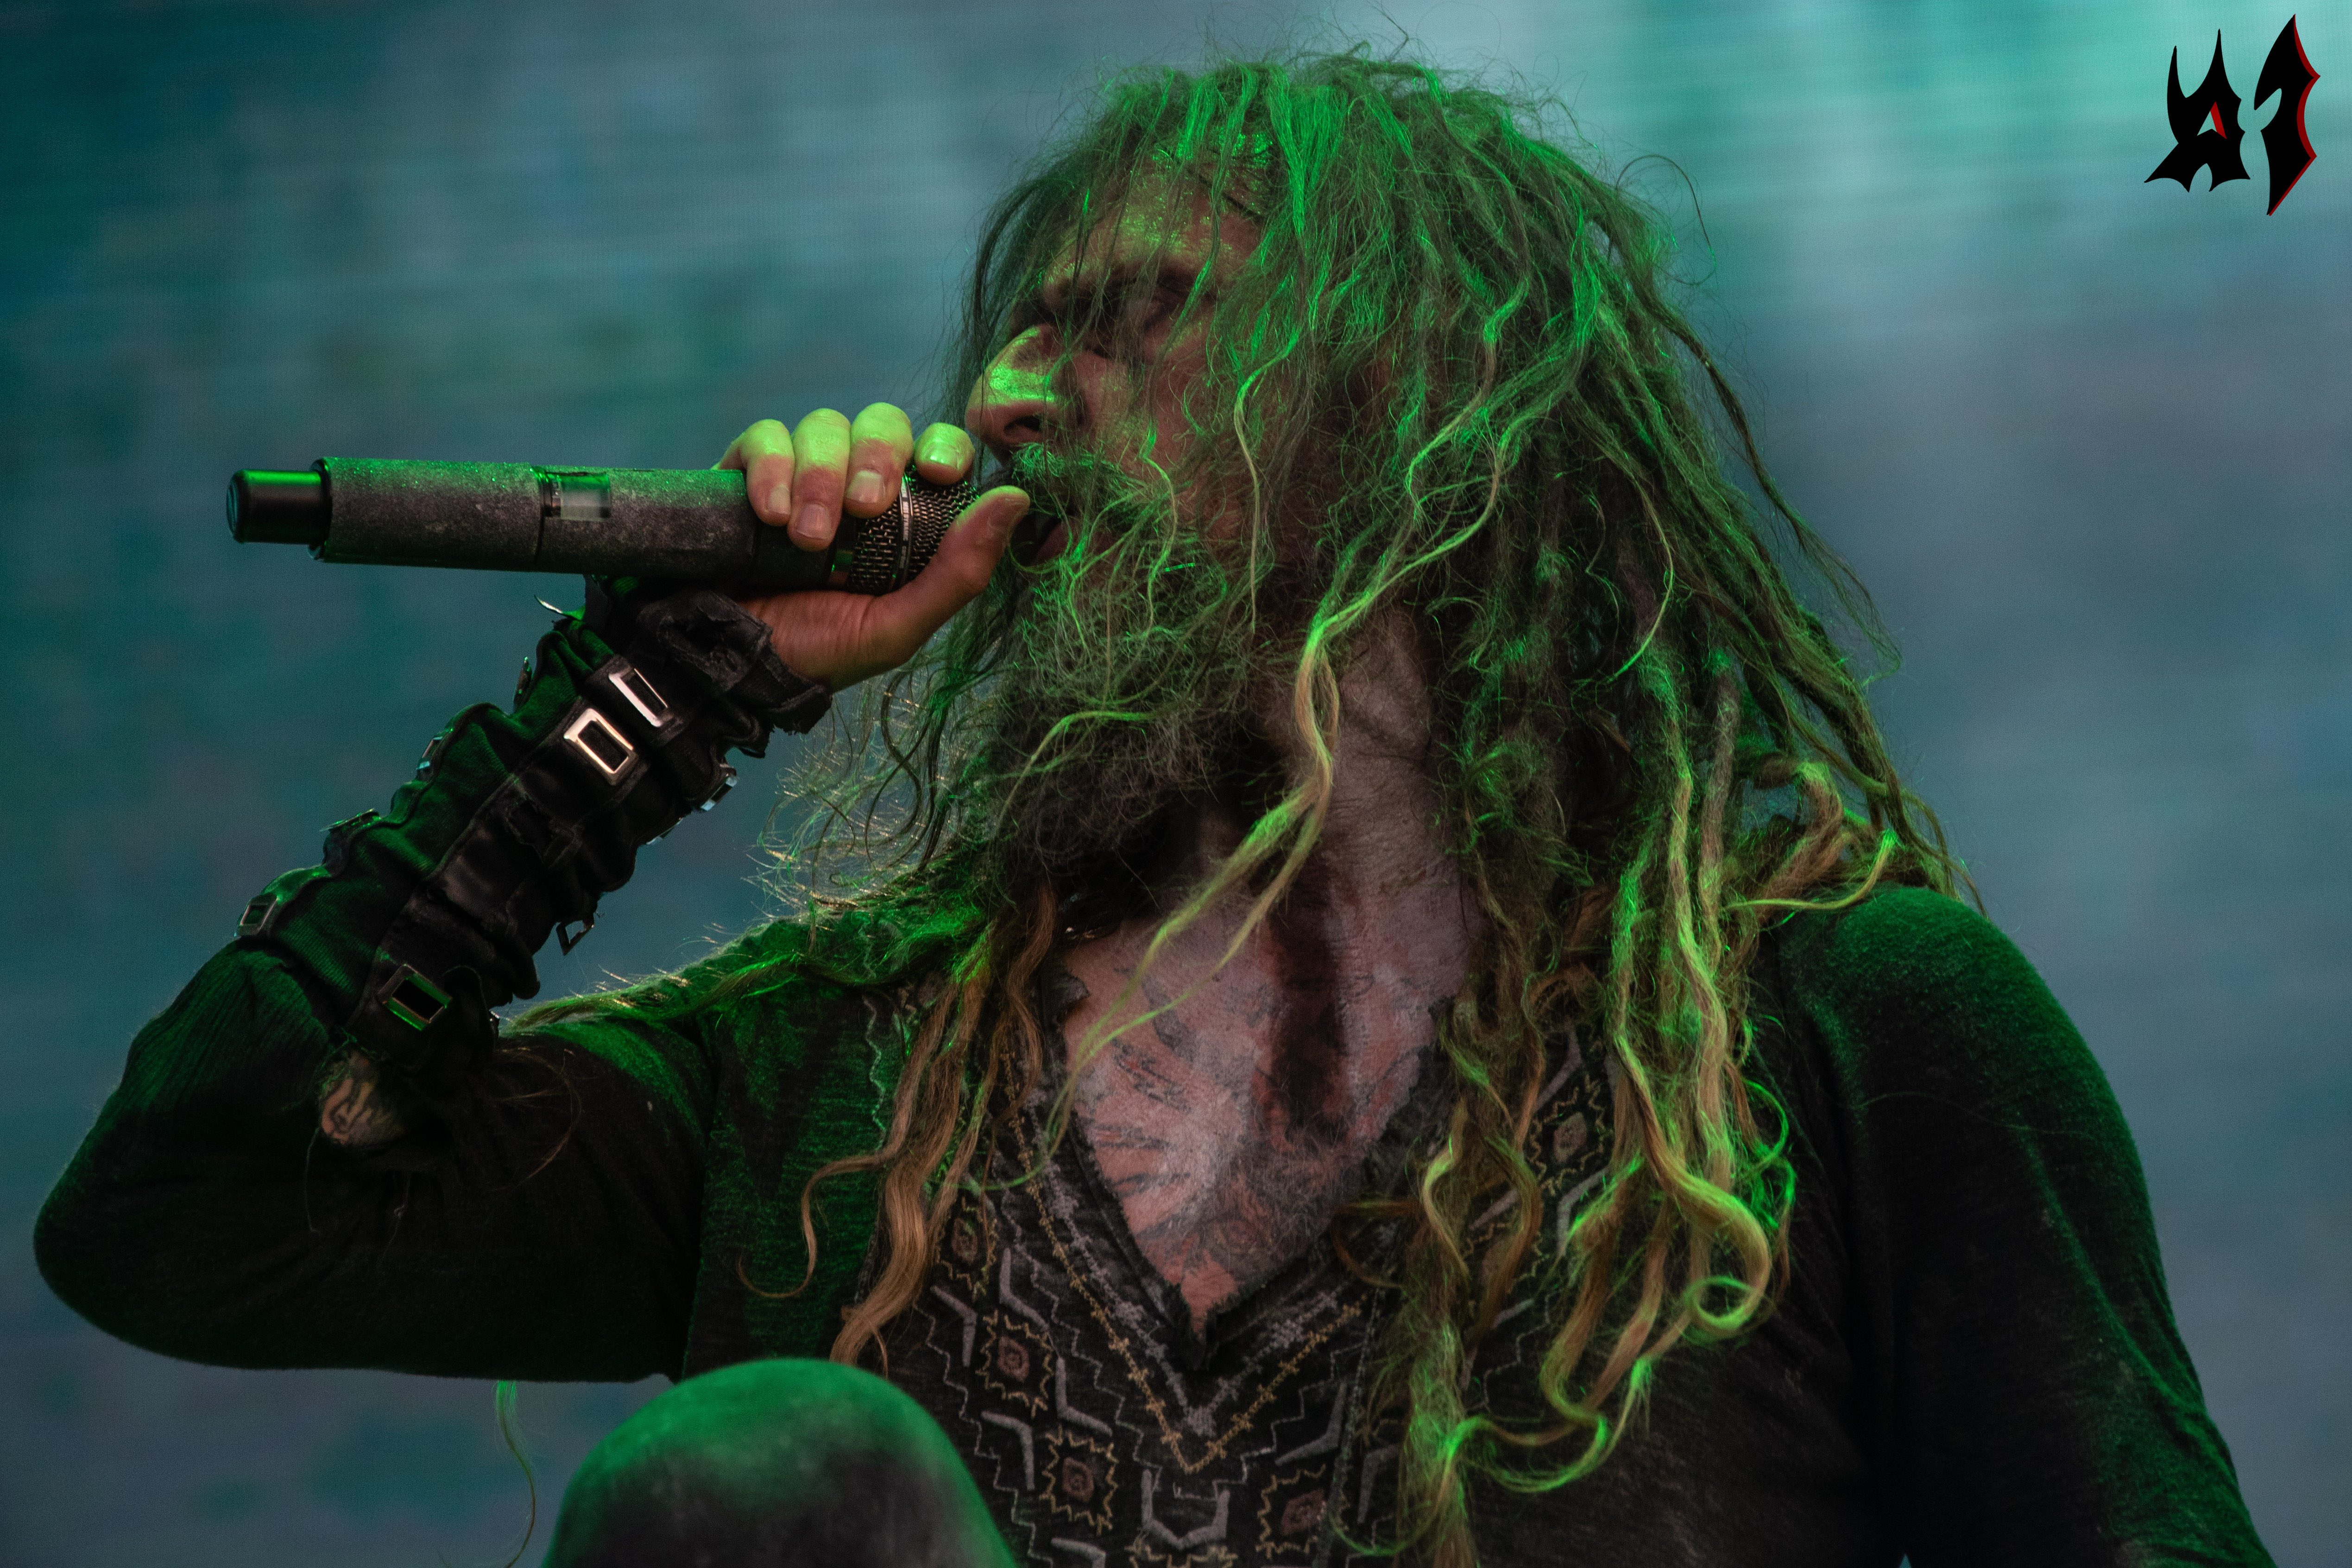 Knotfest - Rob Zombie - 11